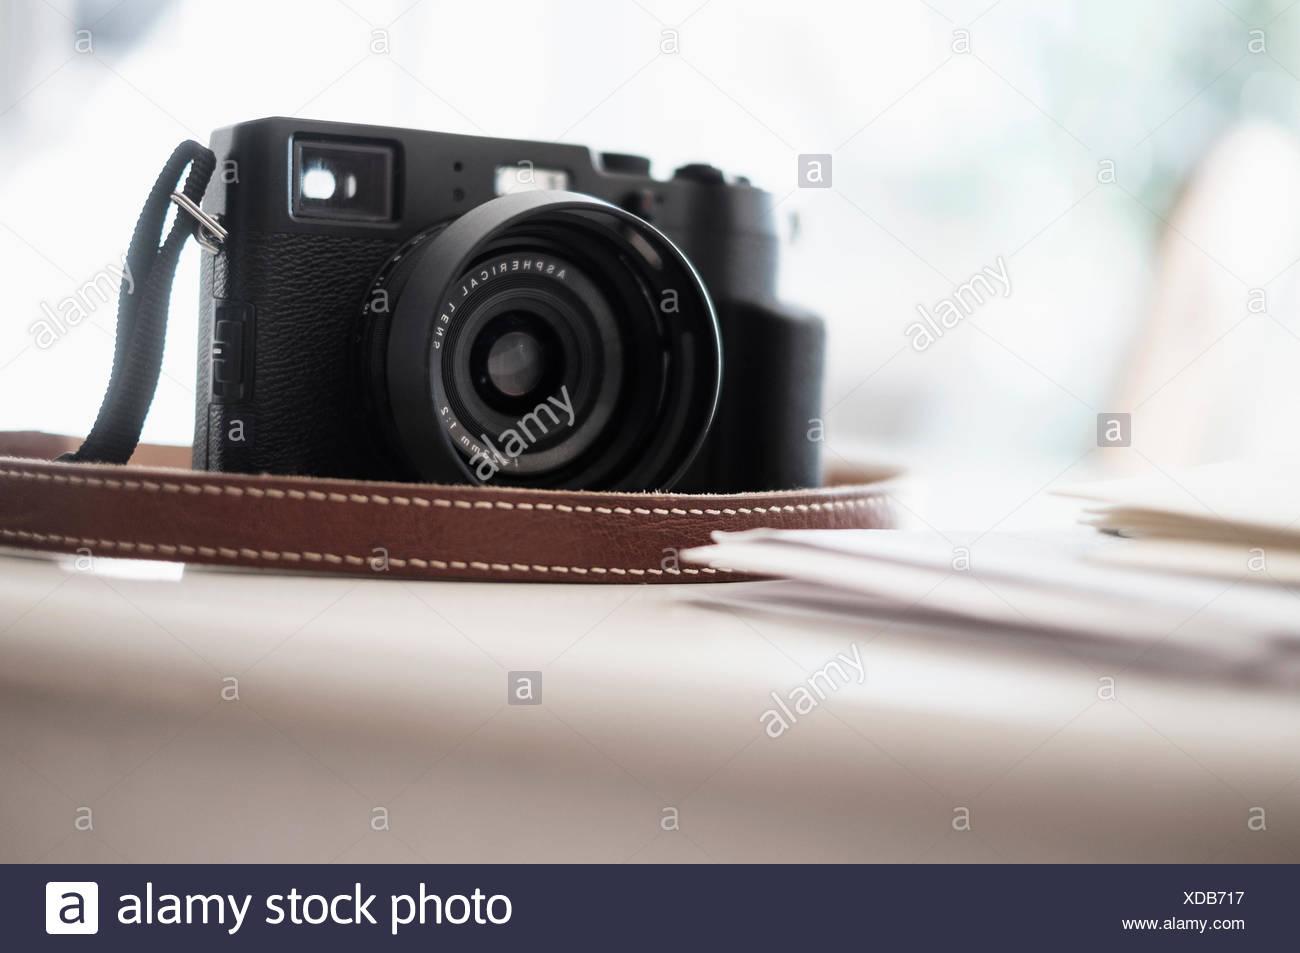 Digital camera on desk - Stock Image